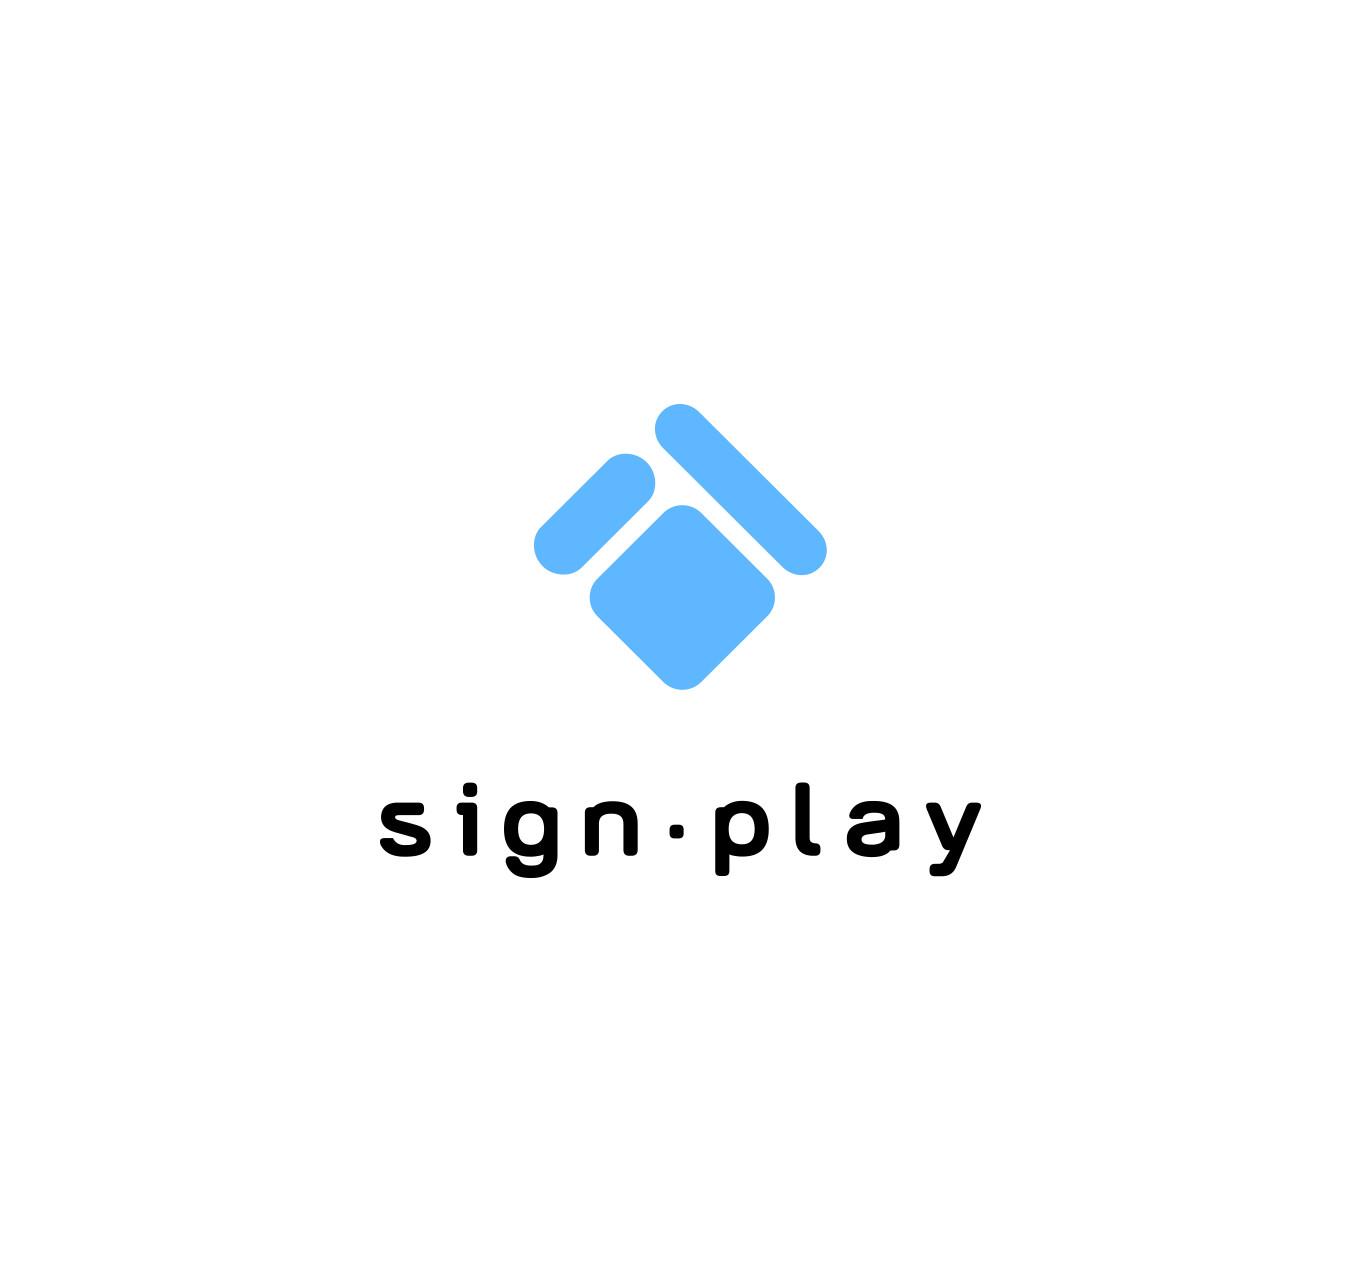 signplay_website1360x1280